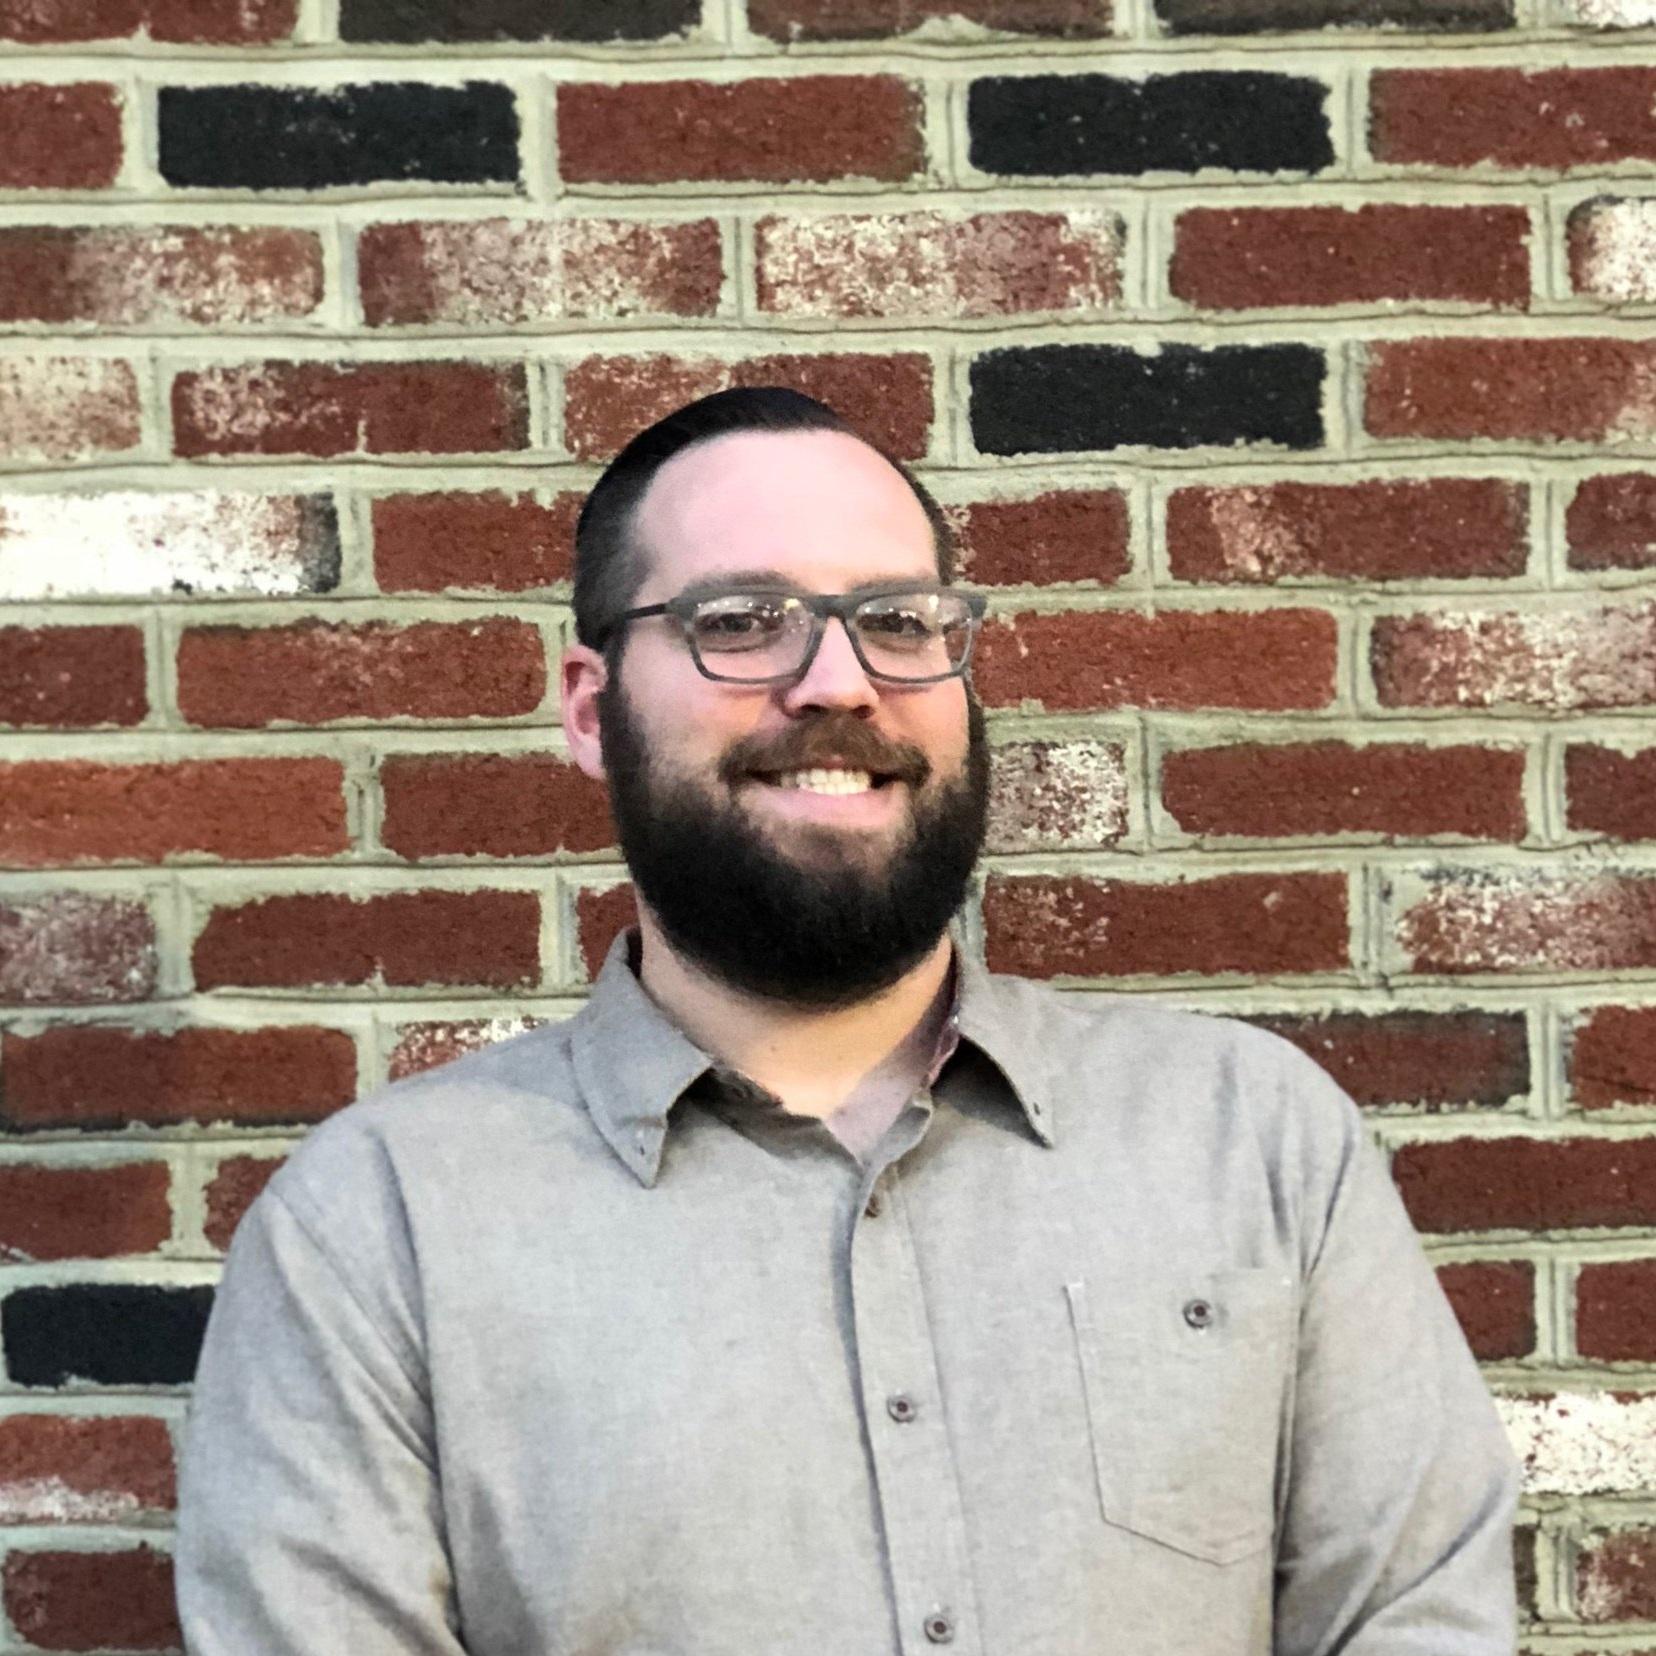 Andrew Eberhart - Communications